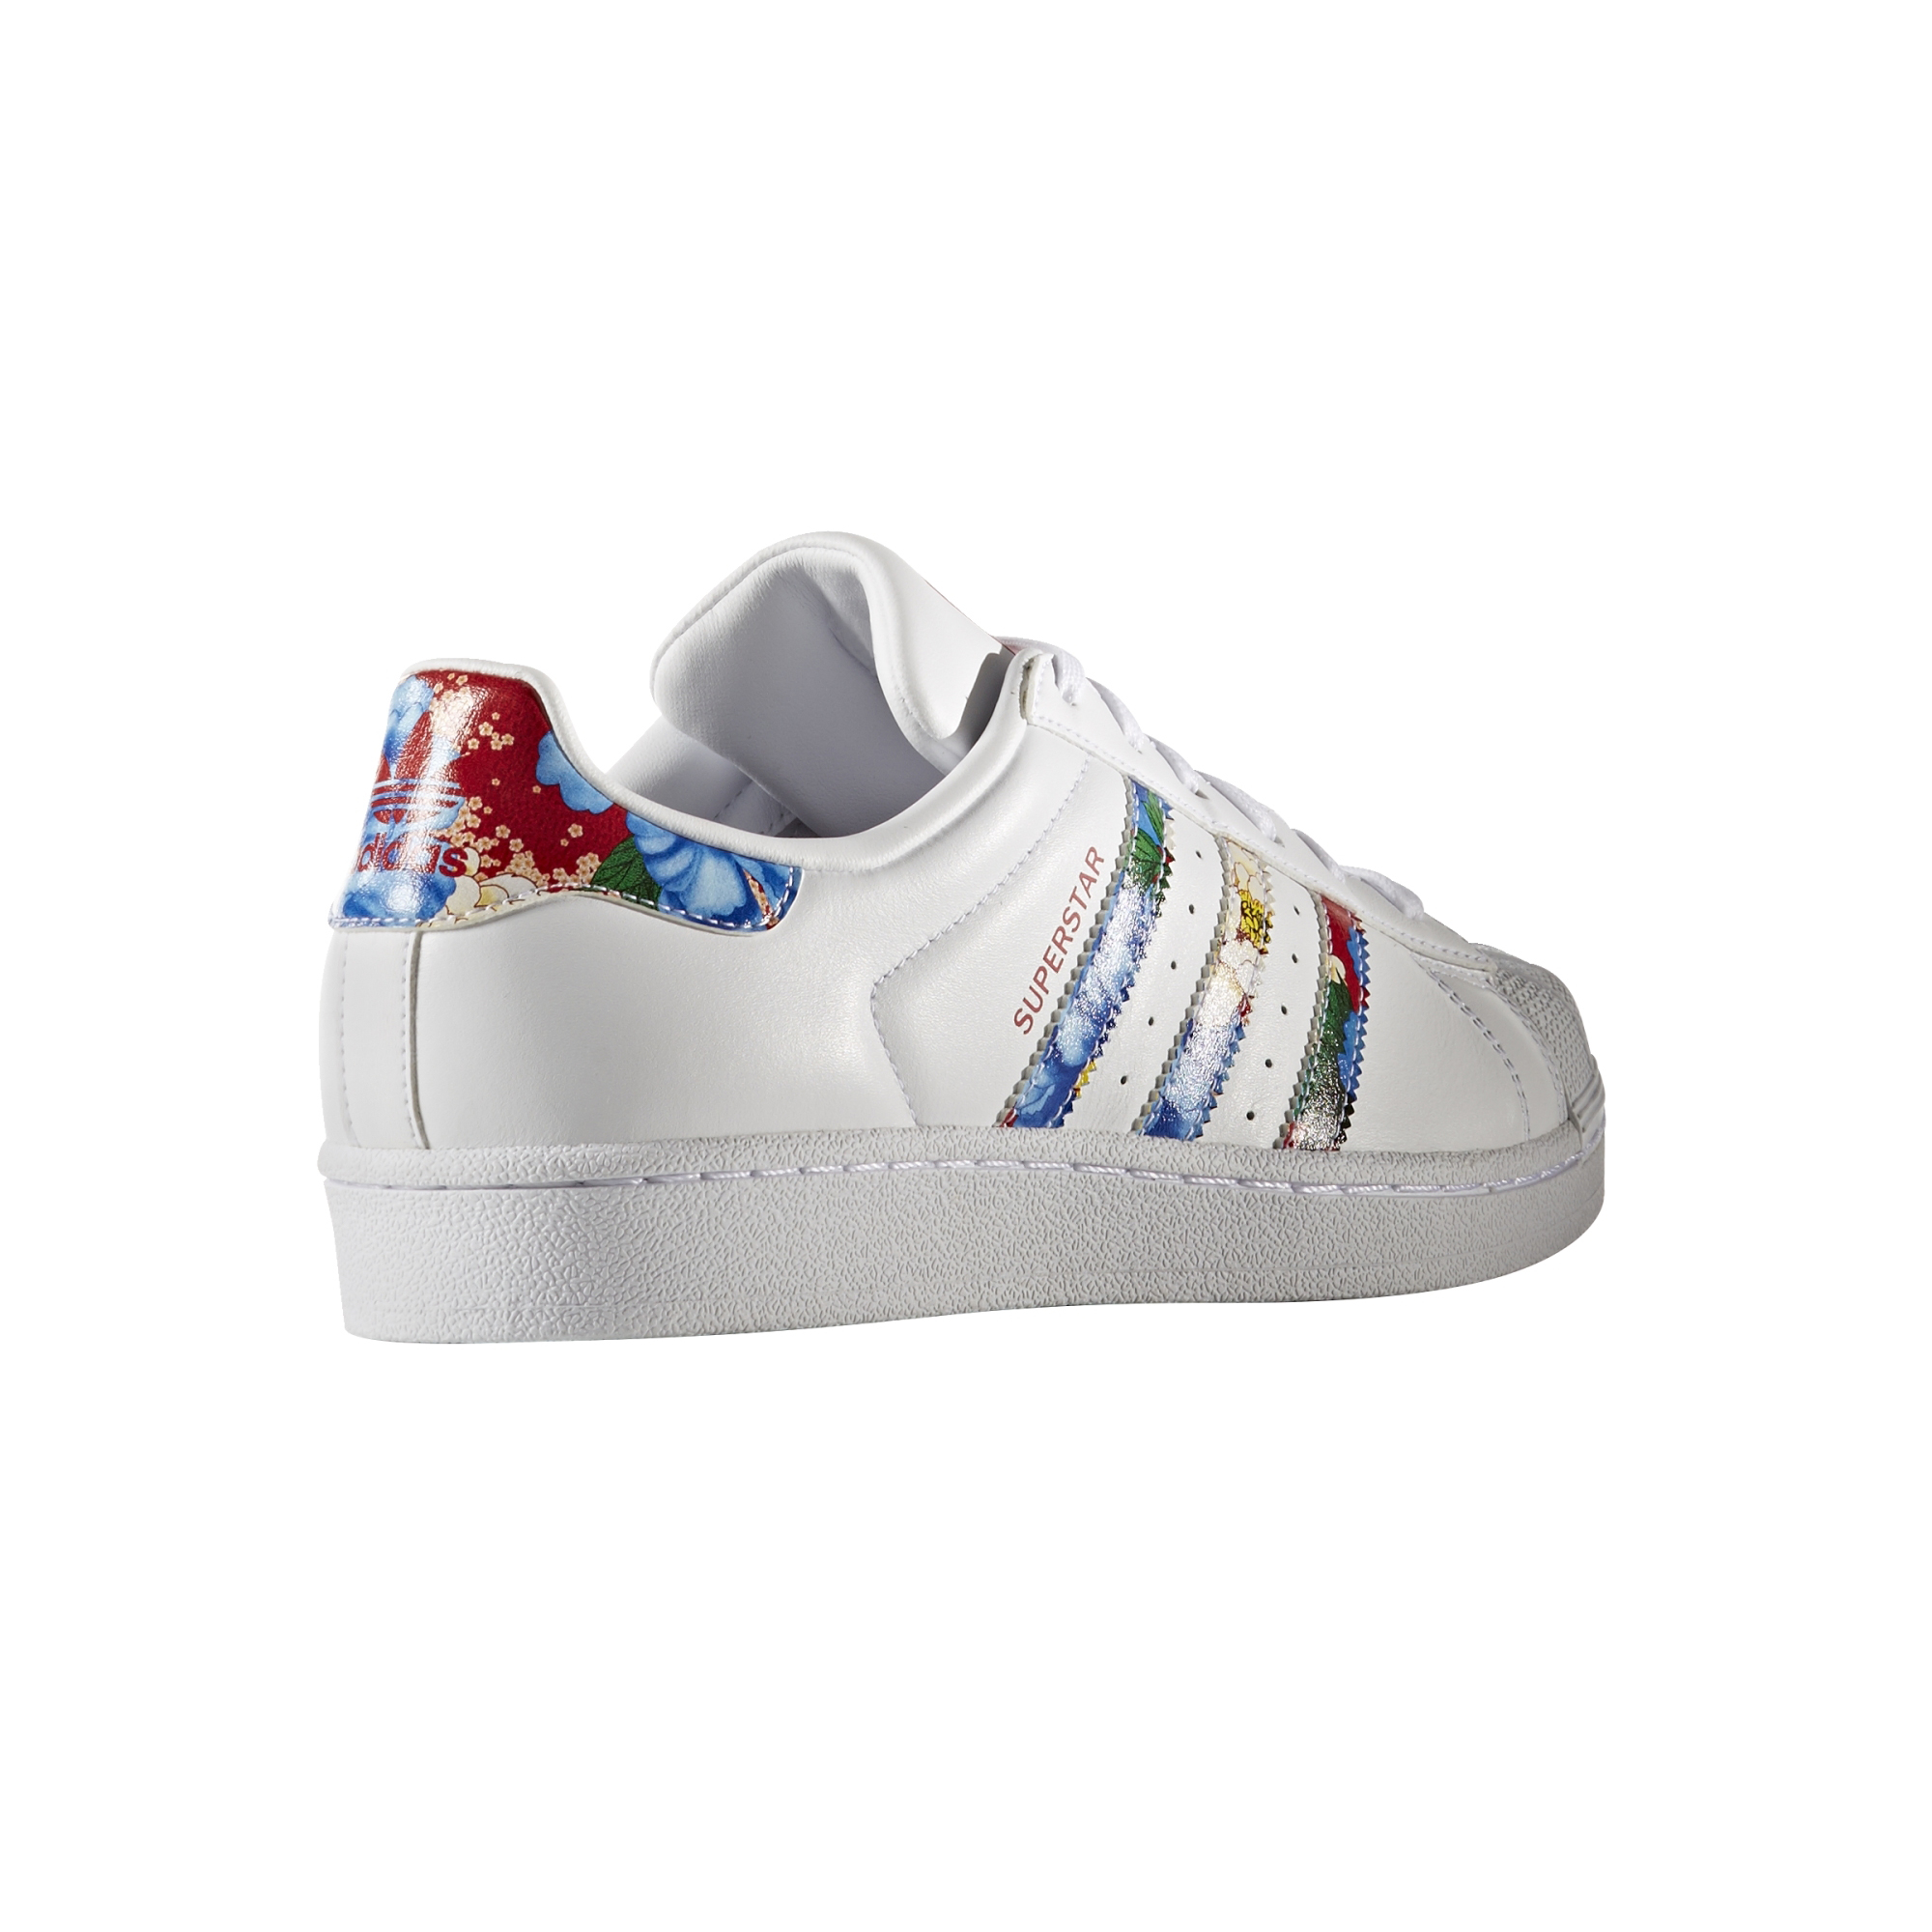 Adidas Originals Superstar W Multicolor 0paIN